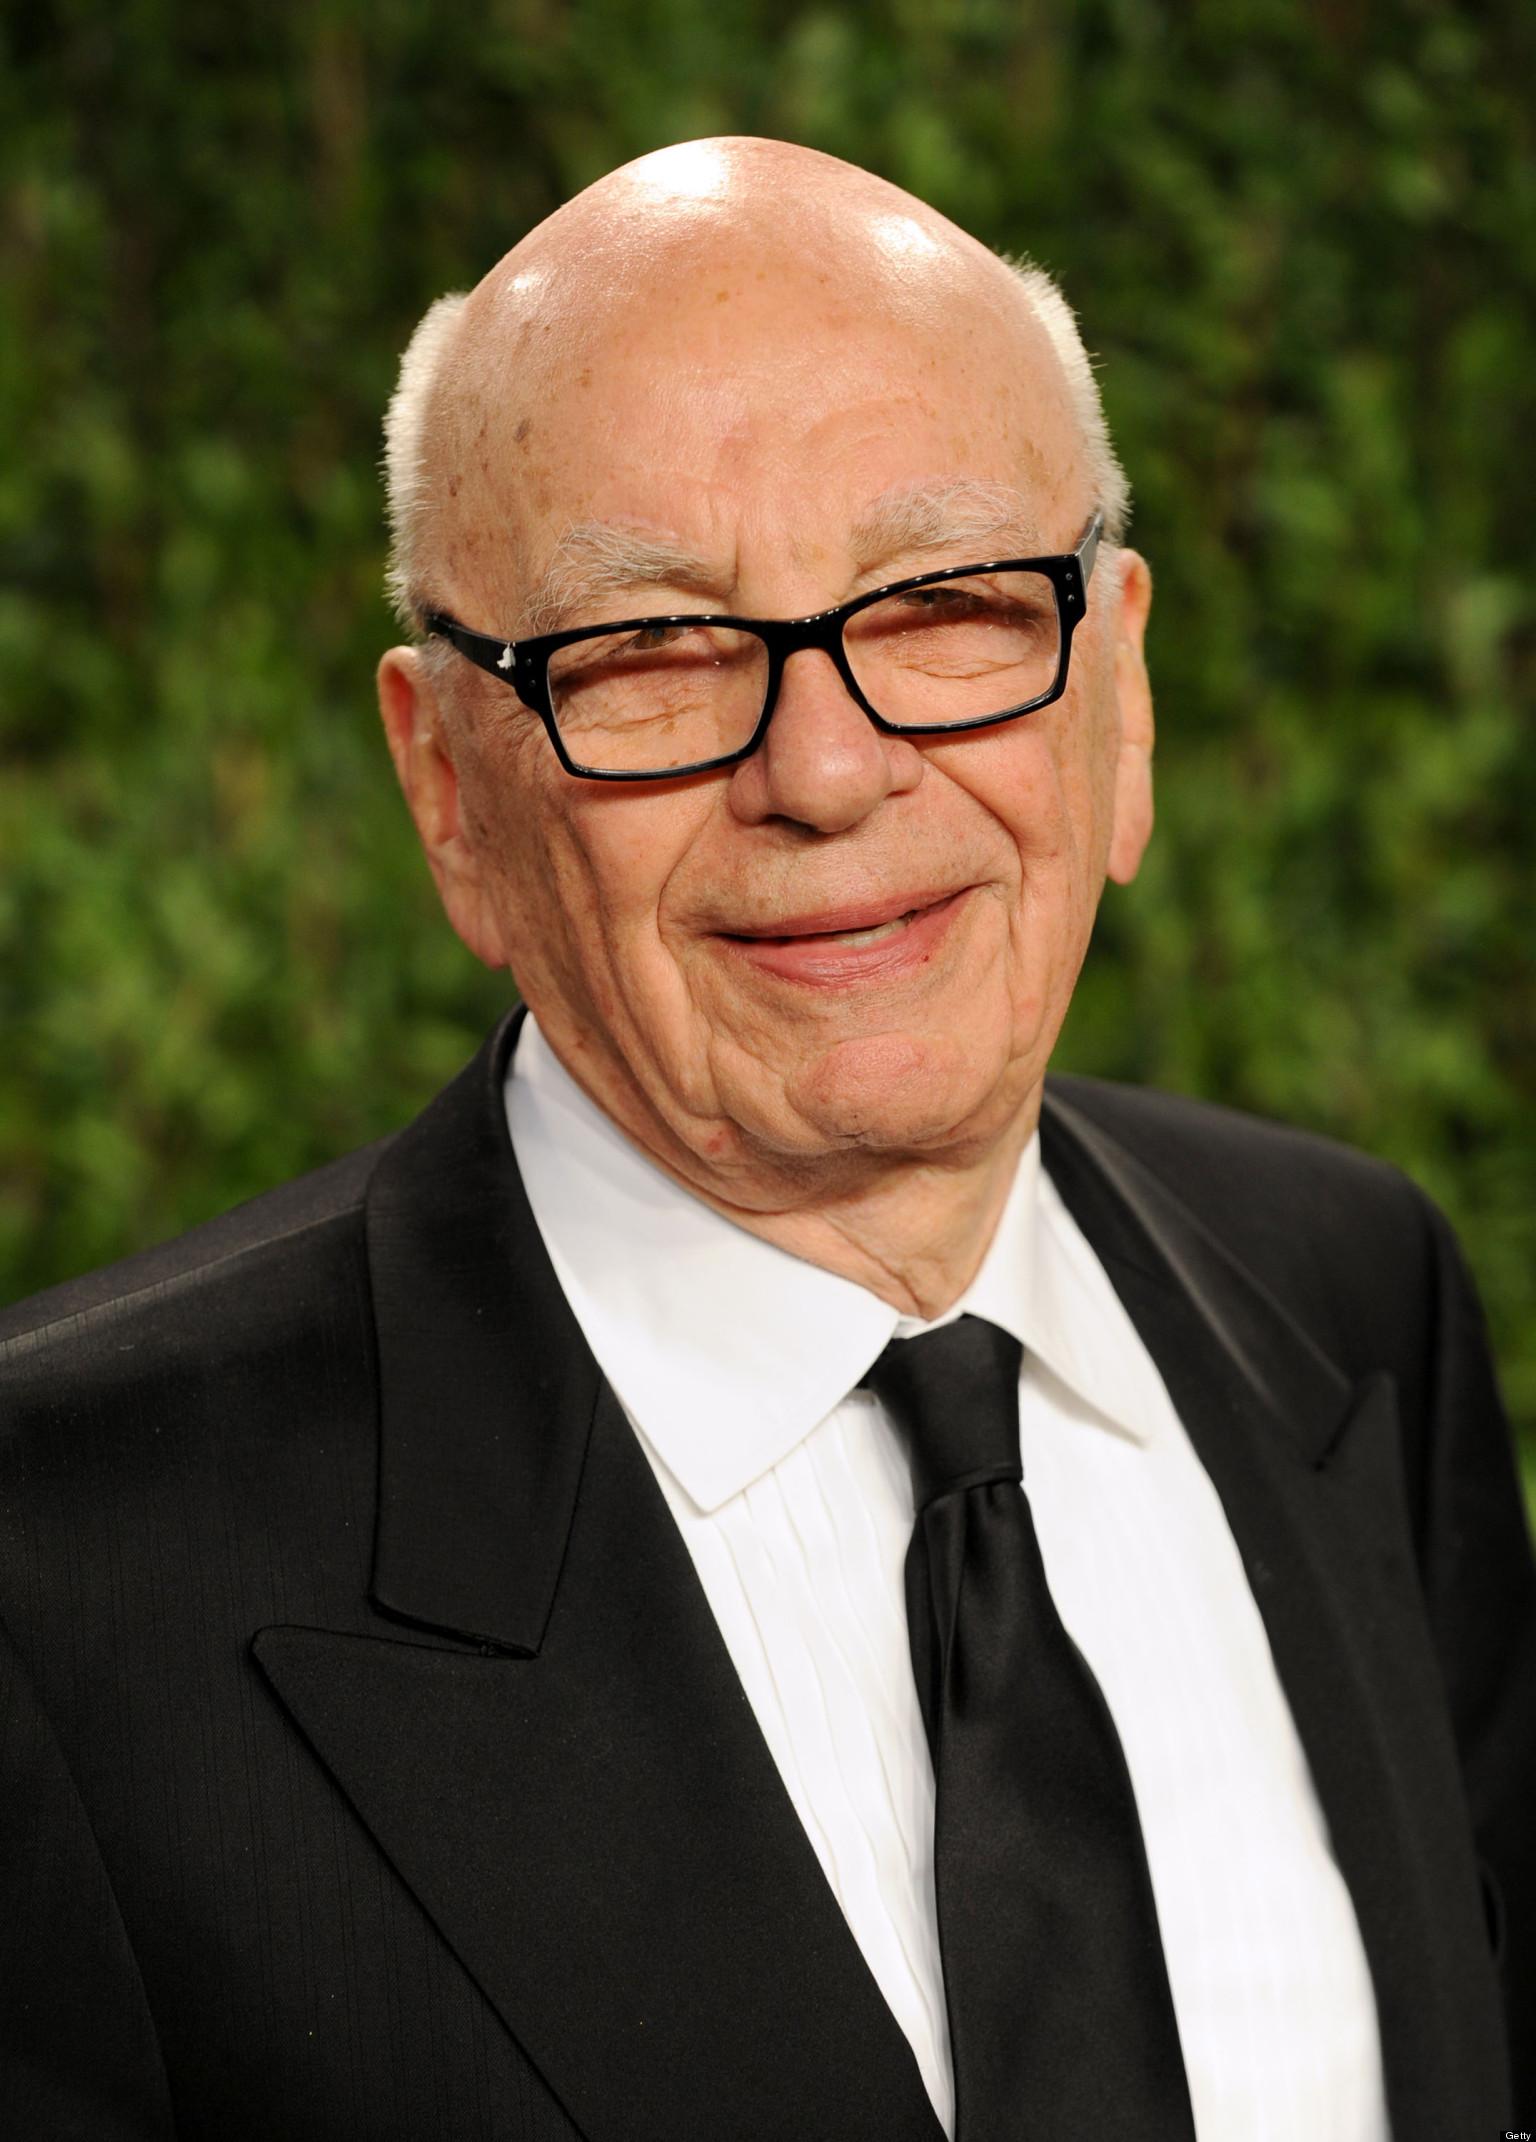 Rupert Murdoch Jumps The Gun On Missing Malaysia Airlines